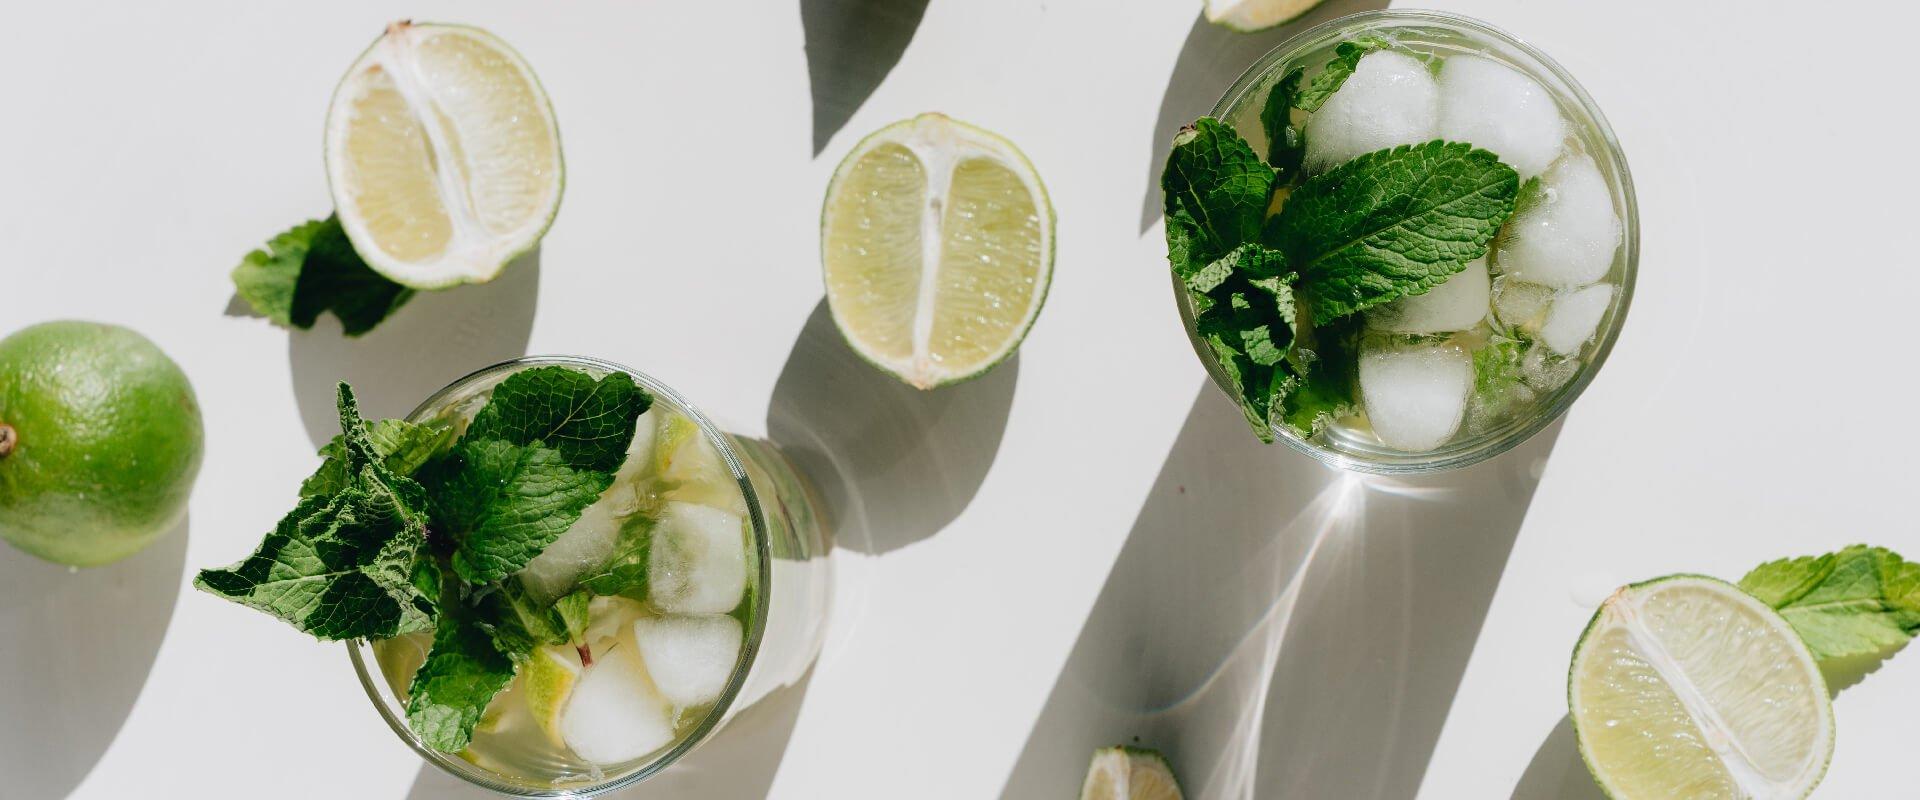 Article-hero-image-mojito green tea.jpg